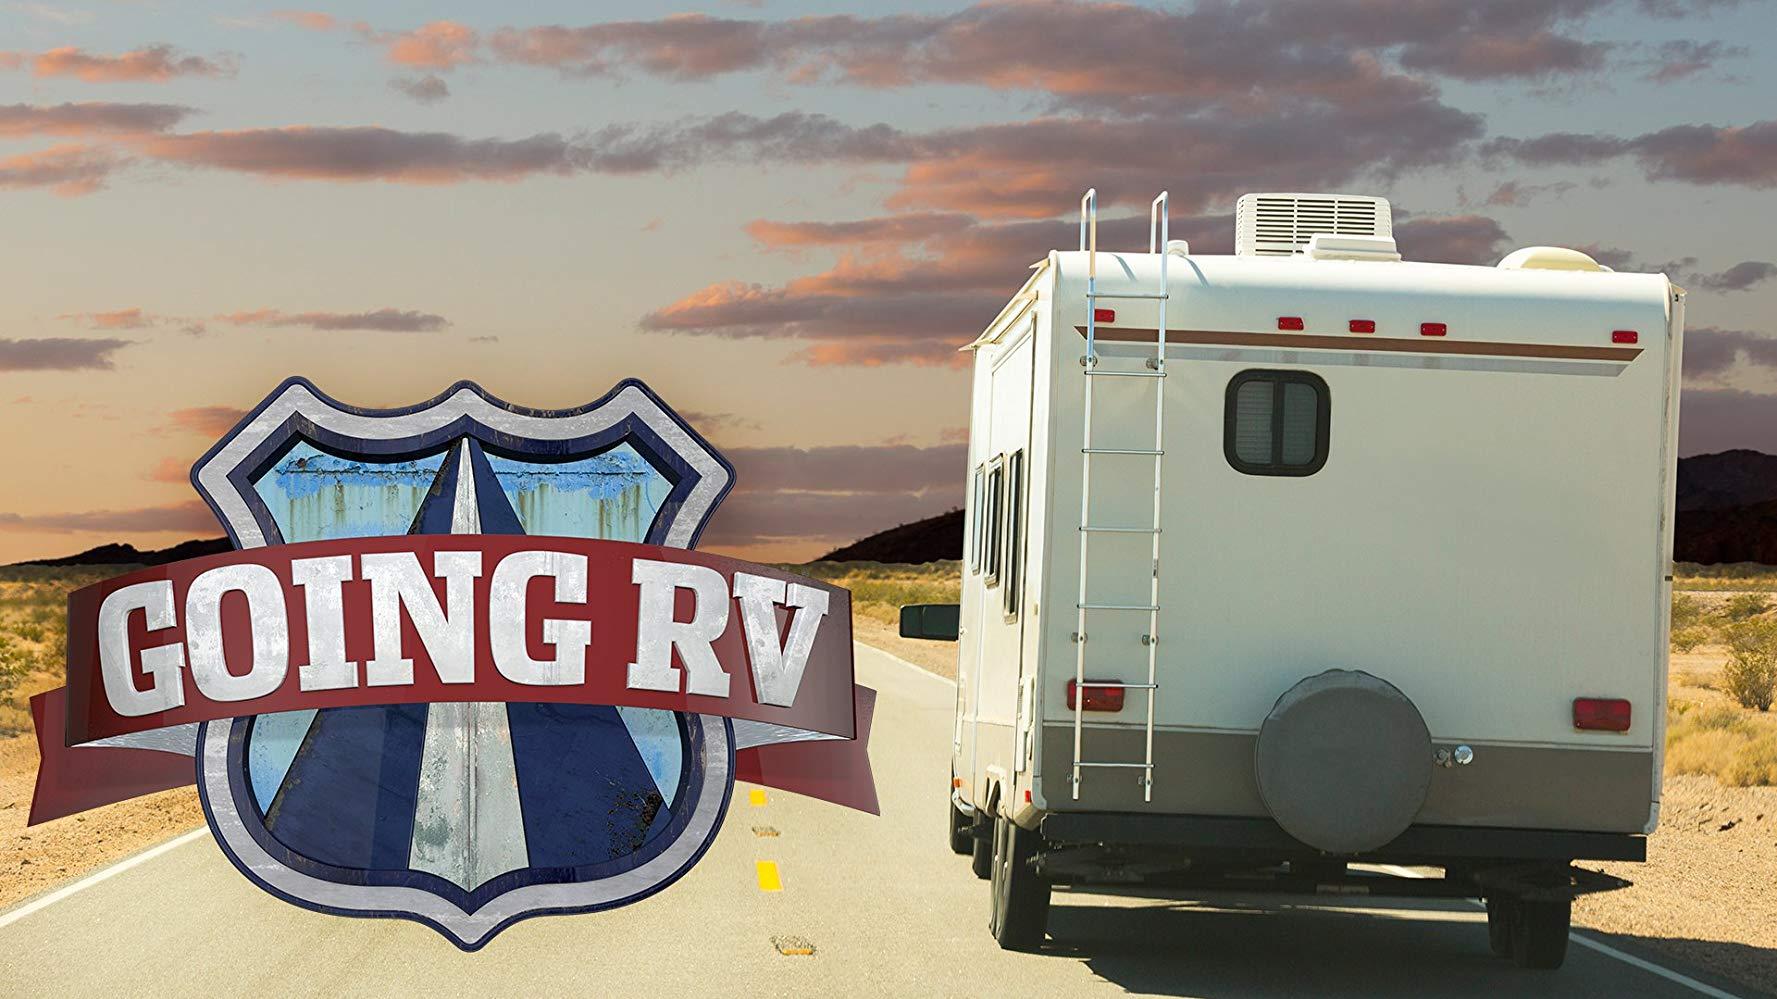 Going RV S01E12 720p HDTV x264-dotTV